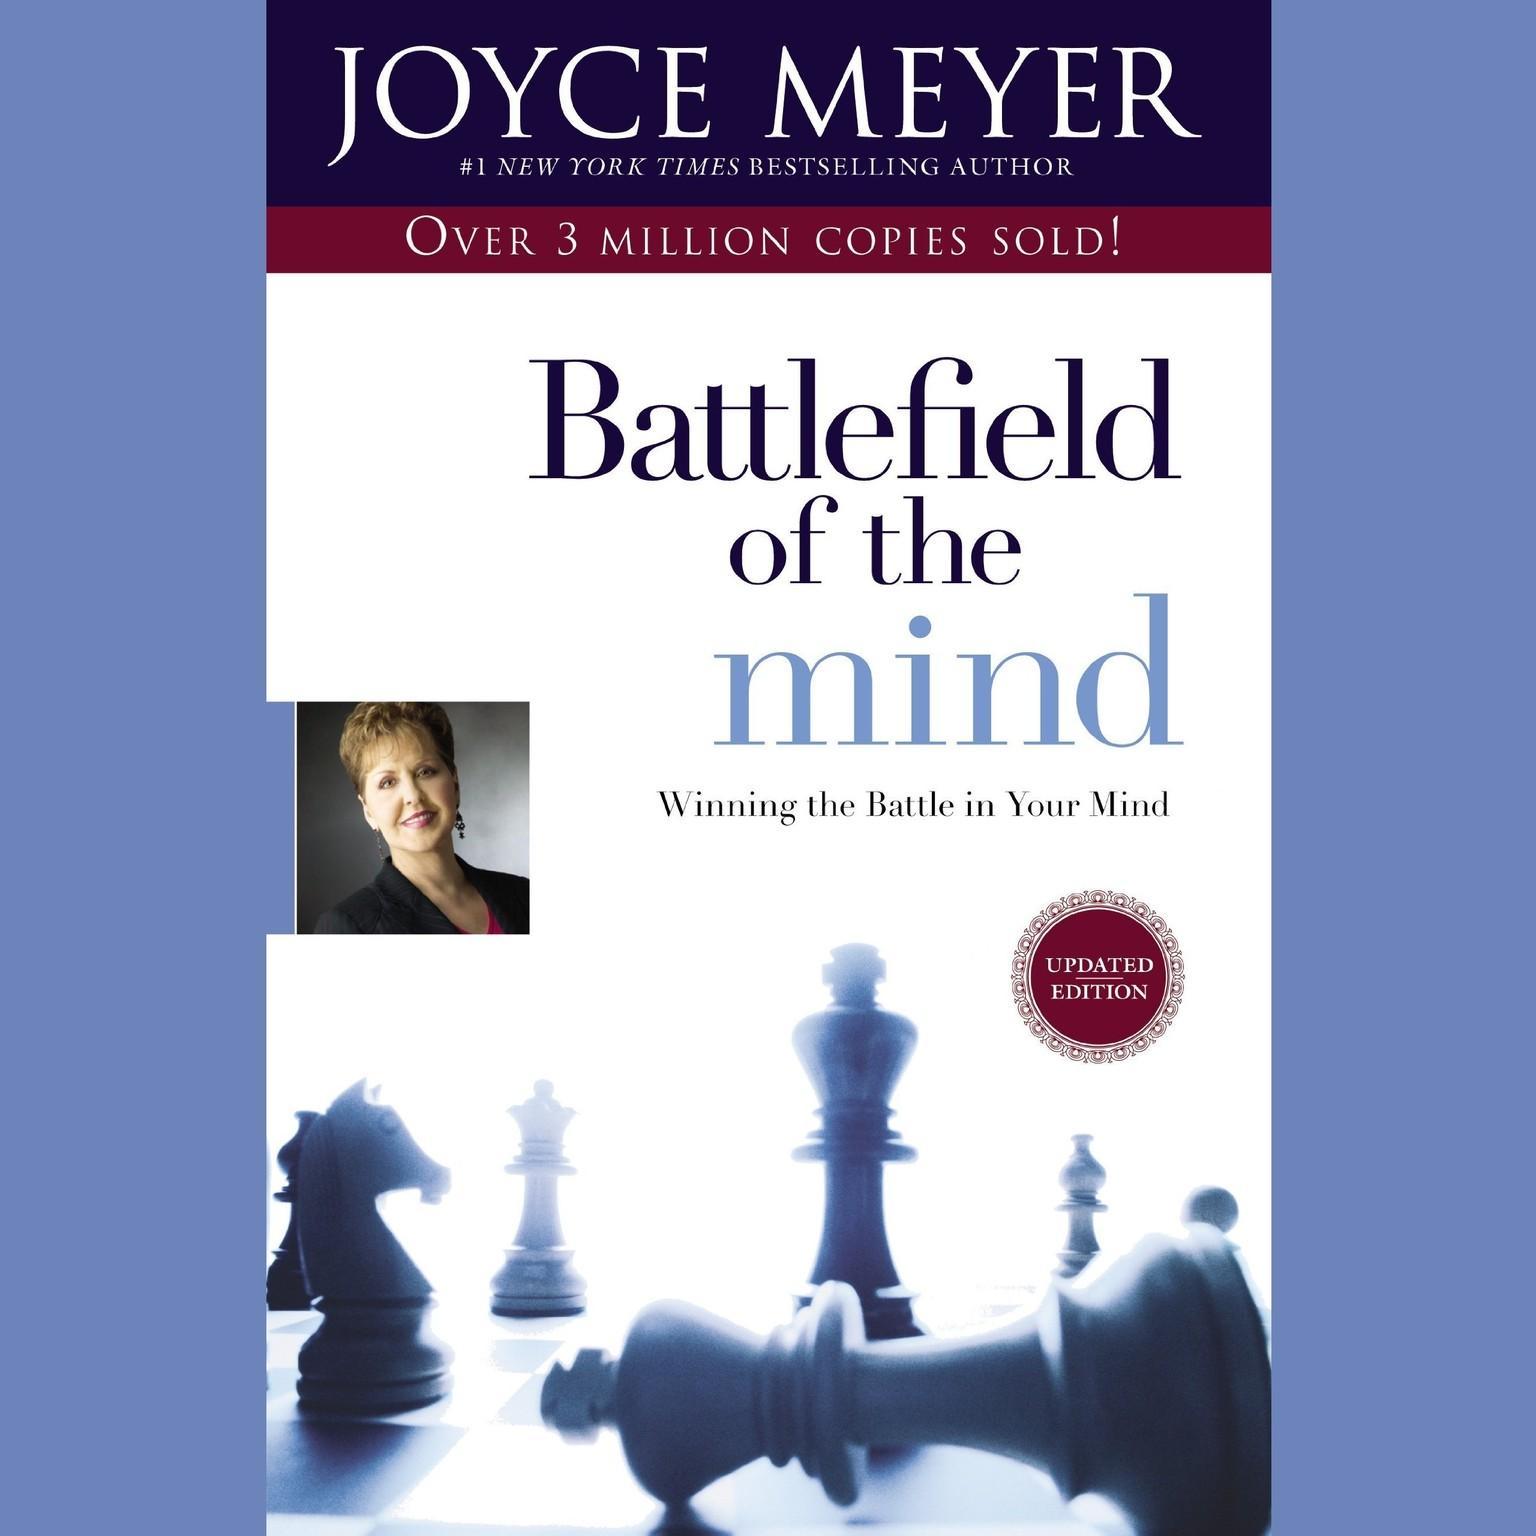 Joyce Meyer Full Books Free Download Pdf